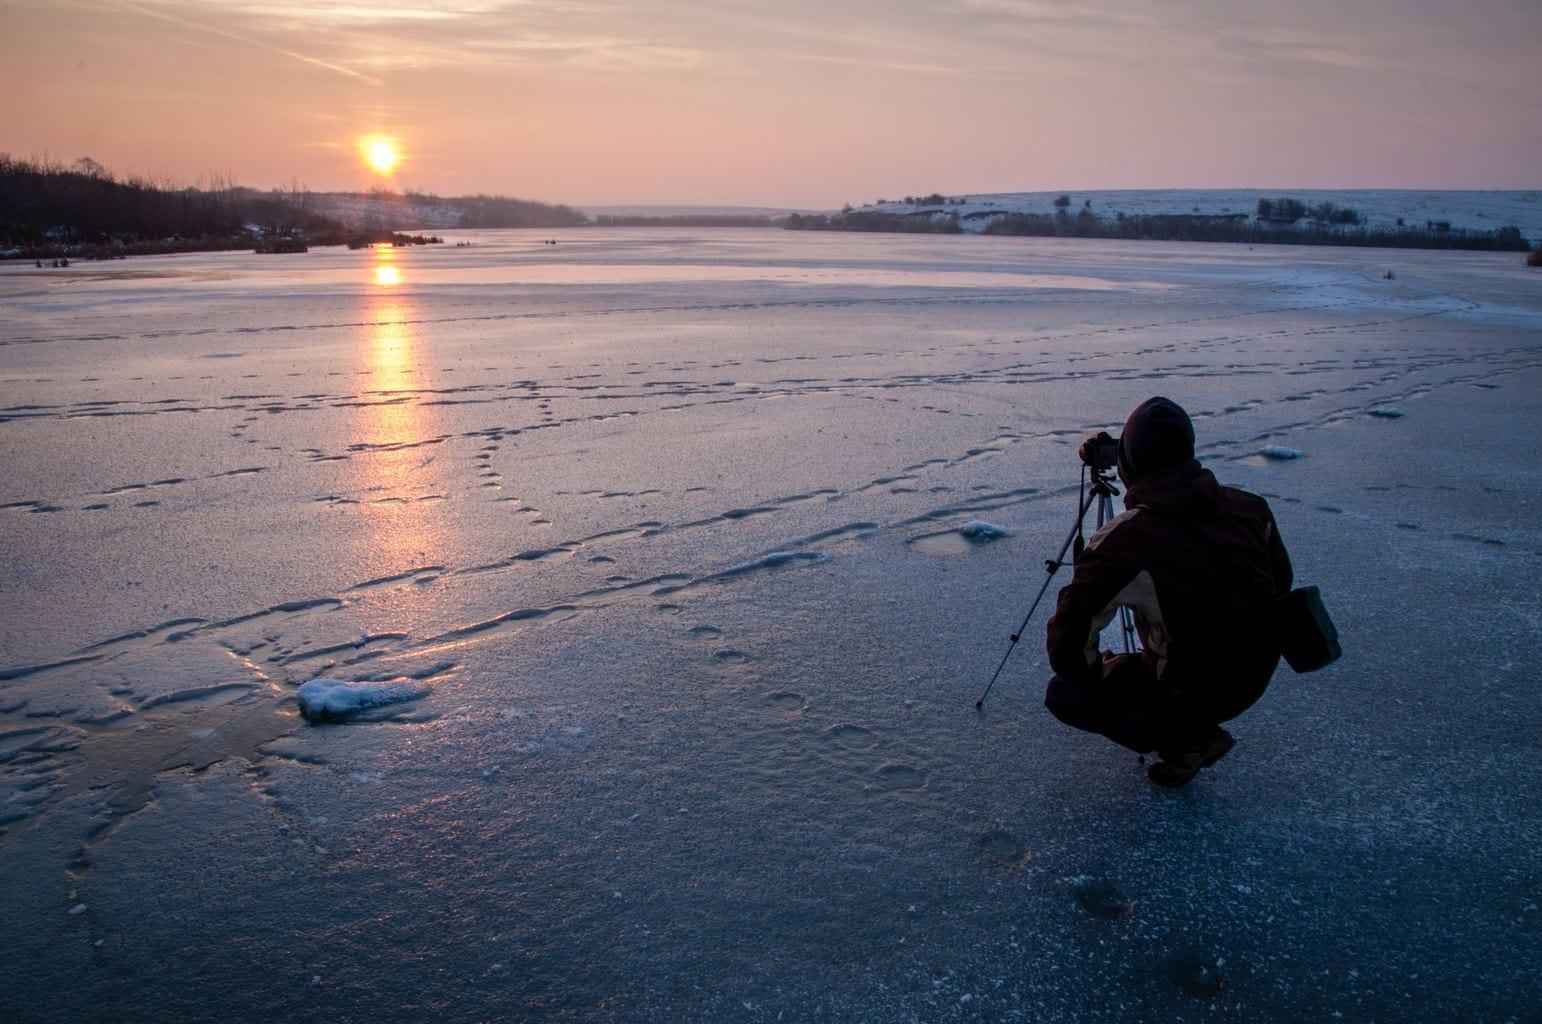 fotografía paisaje fotógrafo en un atardecer